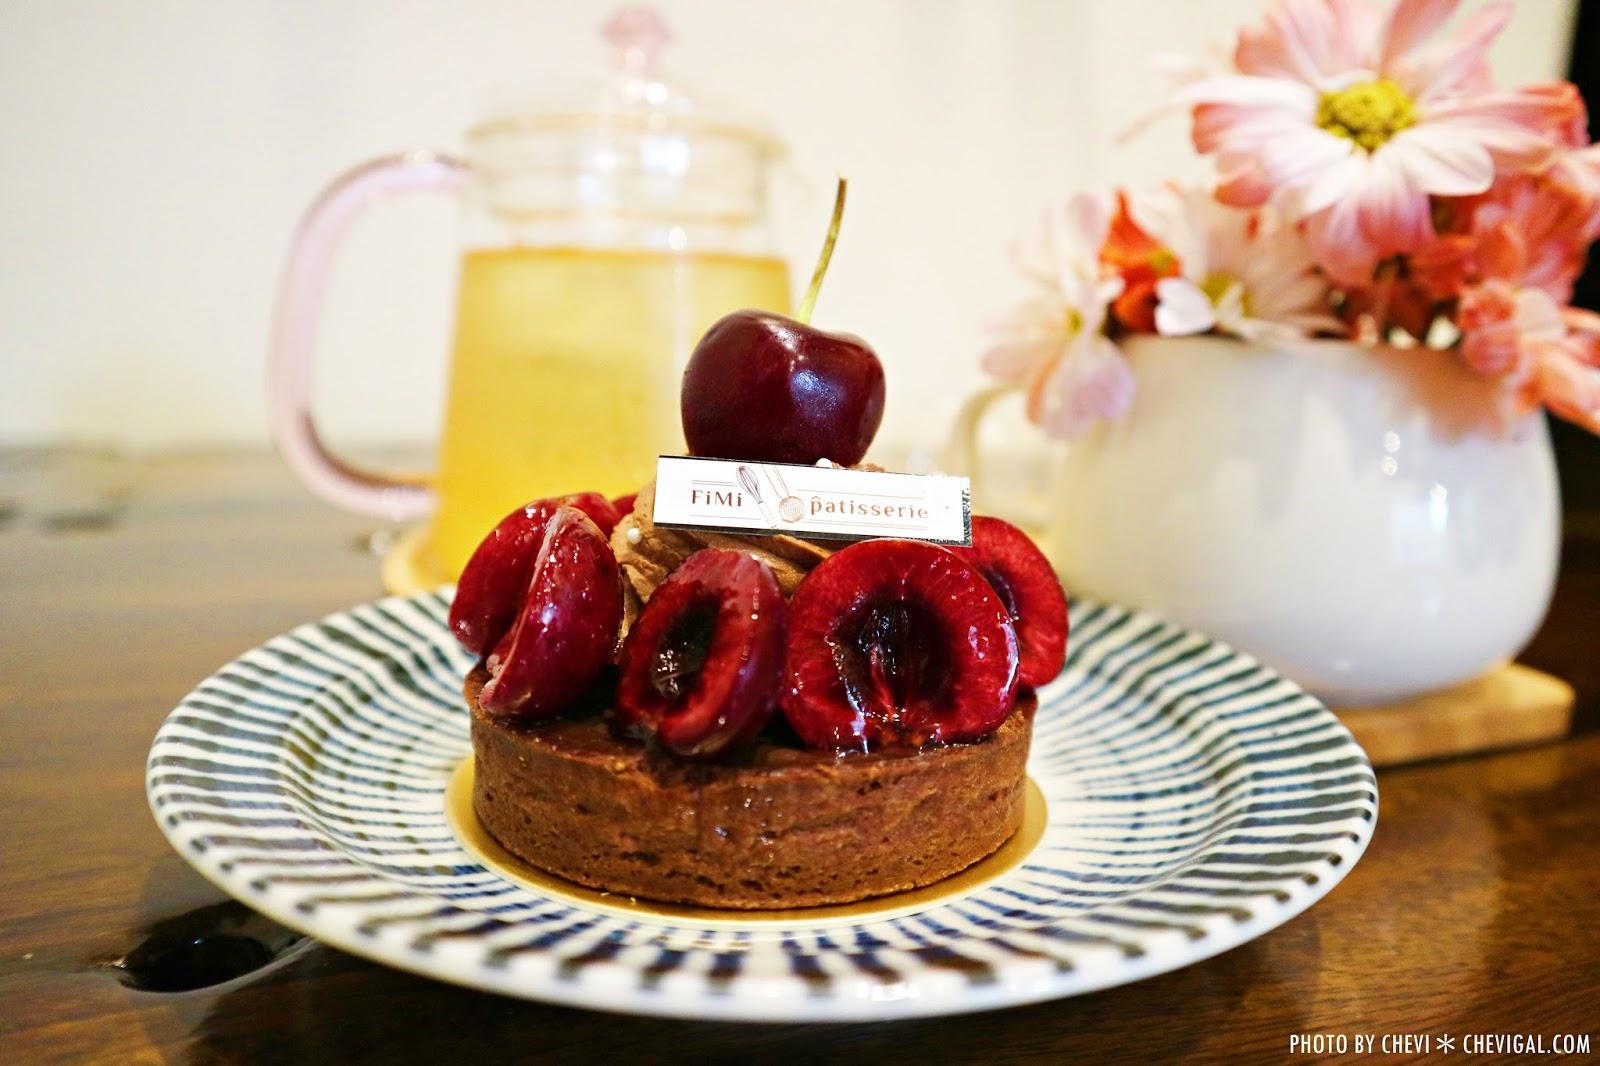 IMG 9578 - 台中烏日│FiMi 小後山廚房。新鮮手作法式甜點。森林清新風格好放鬆